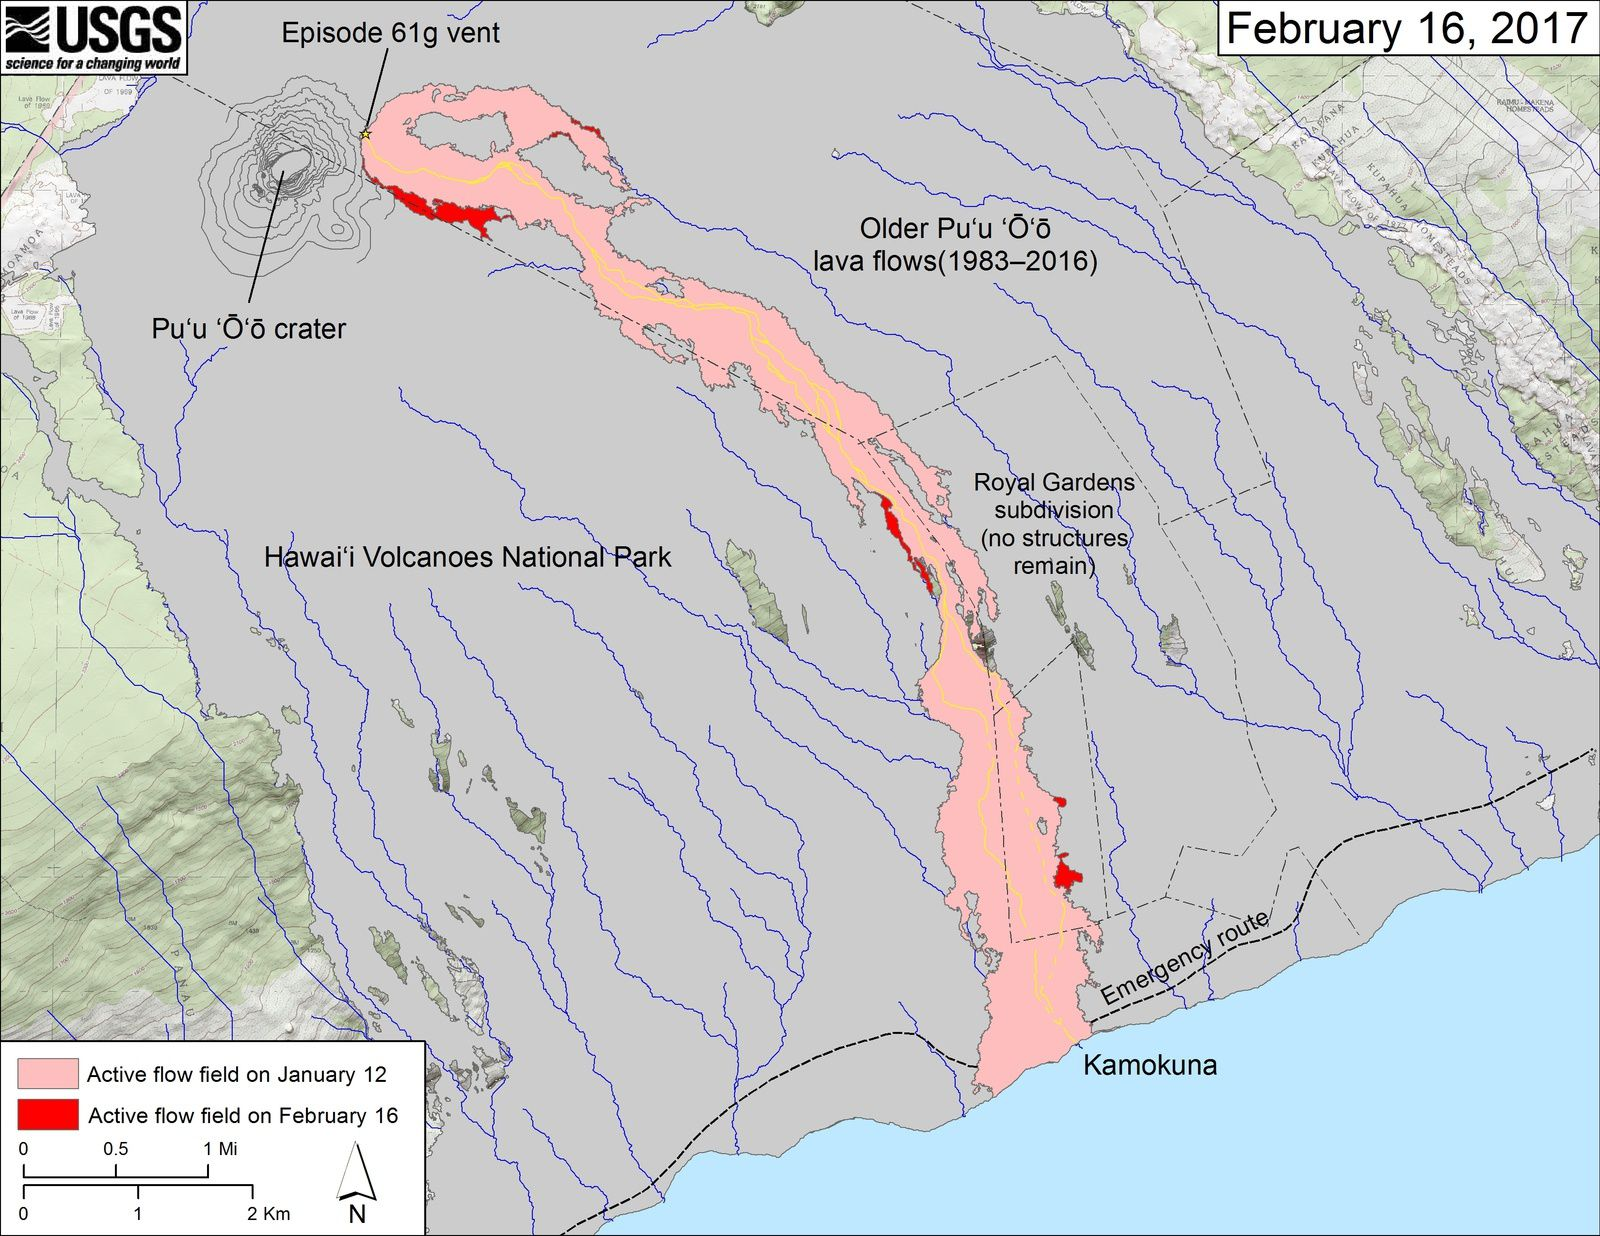 Kilauea / Pu'u O'o - carte des coulées et breakouts au 16.02.2017 - Doc. HVO